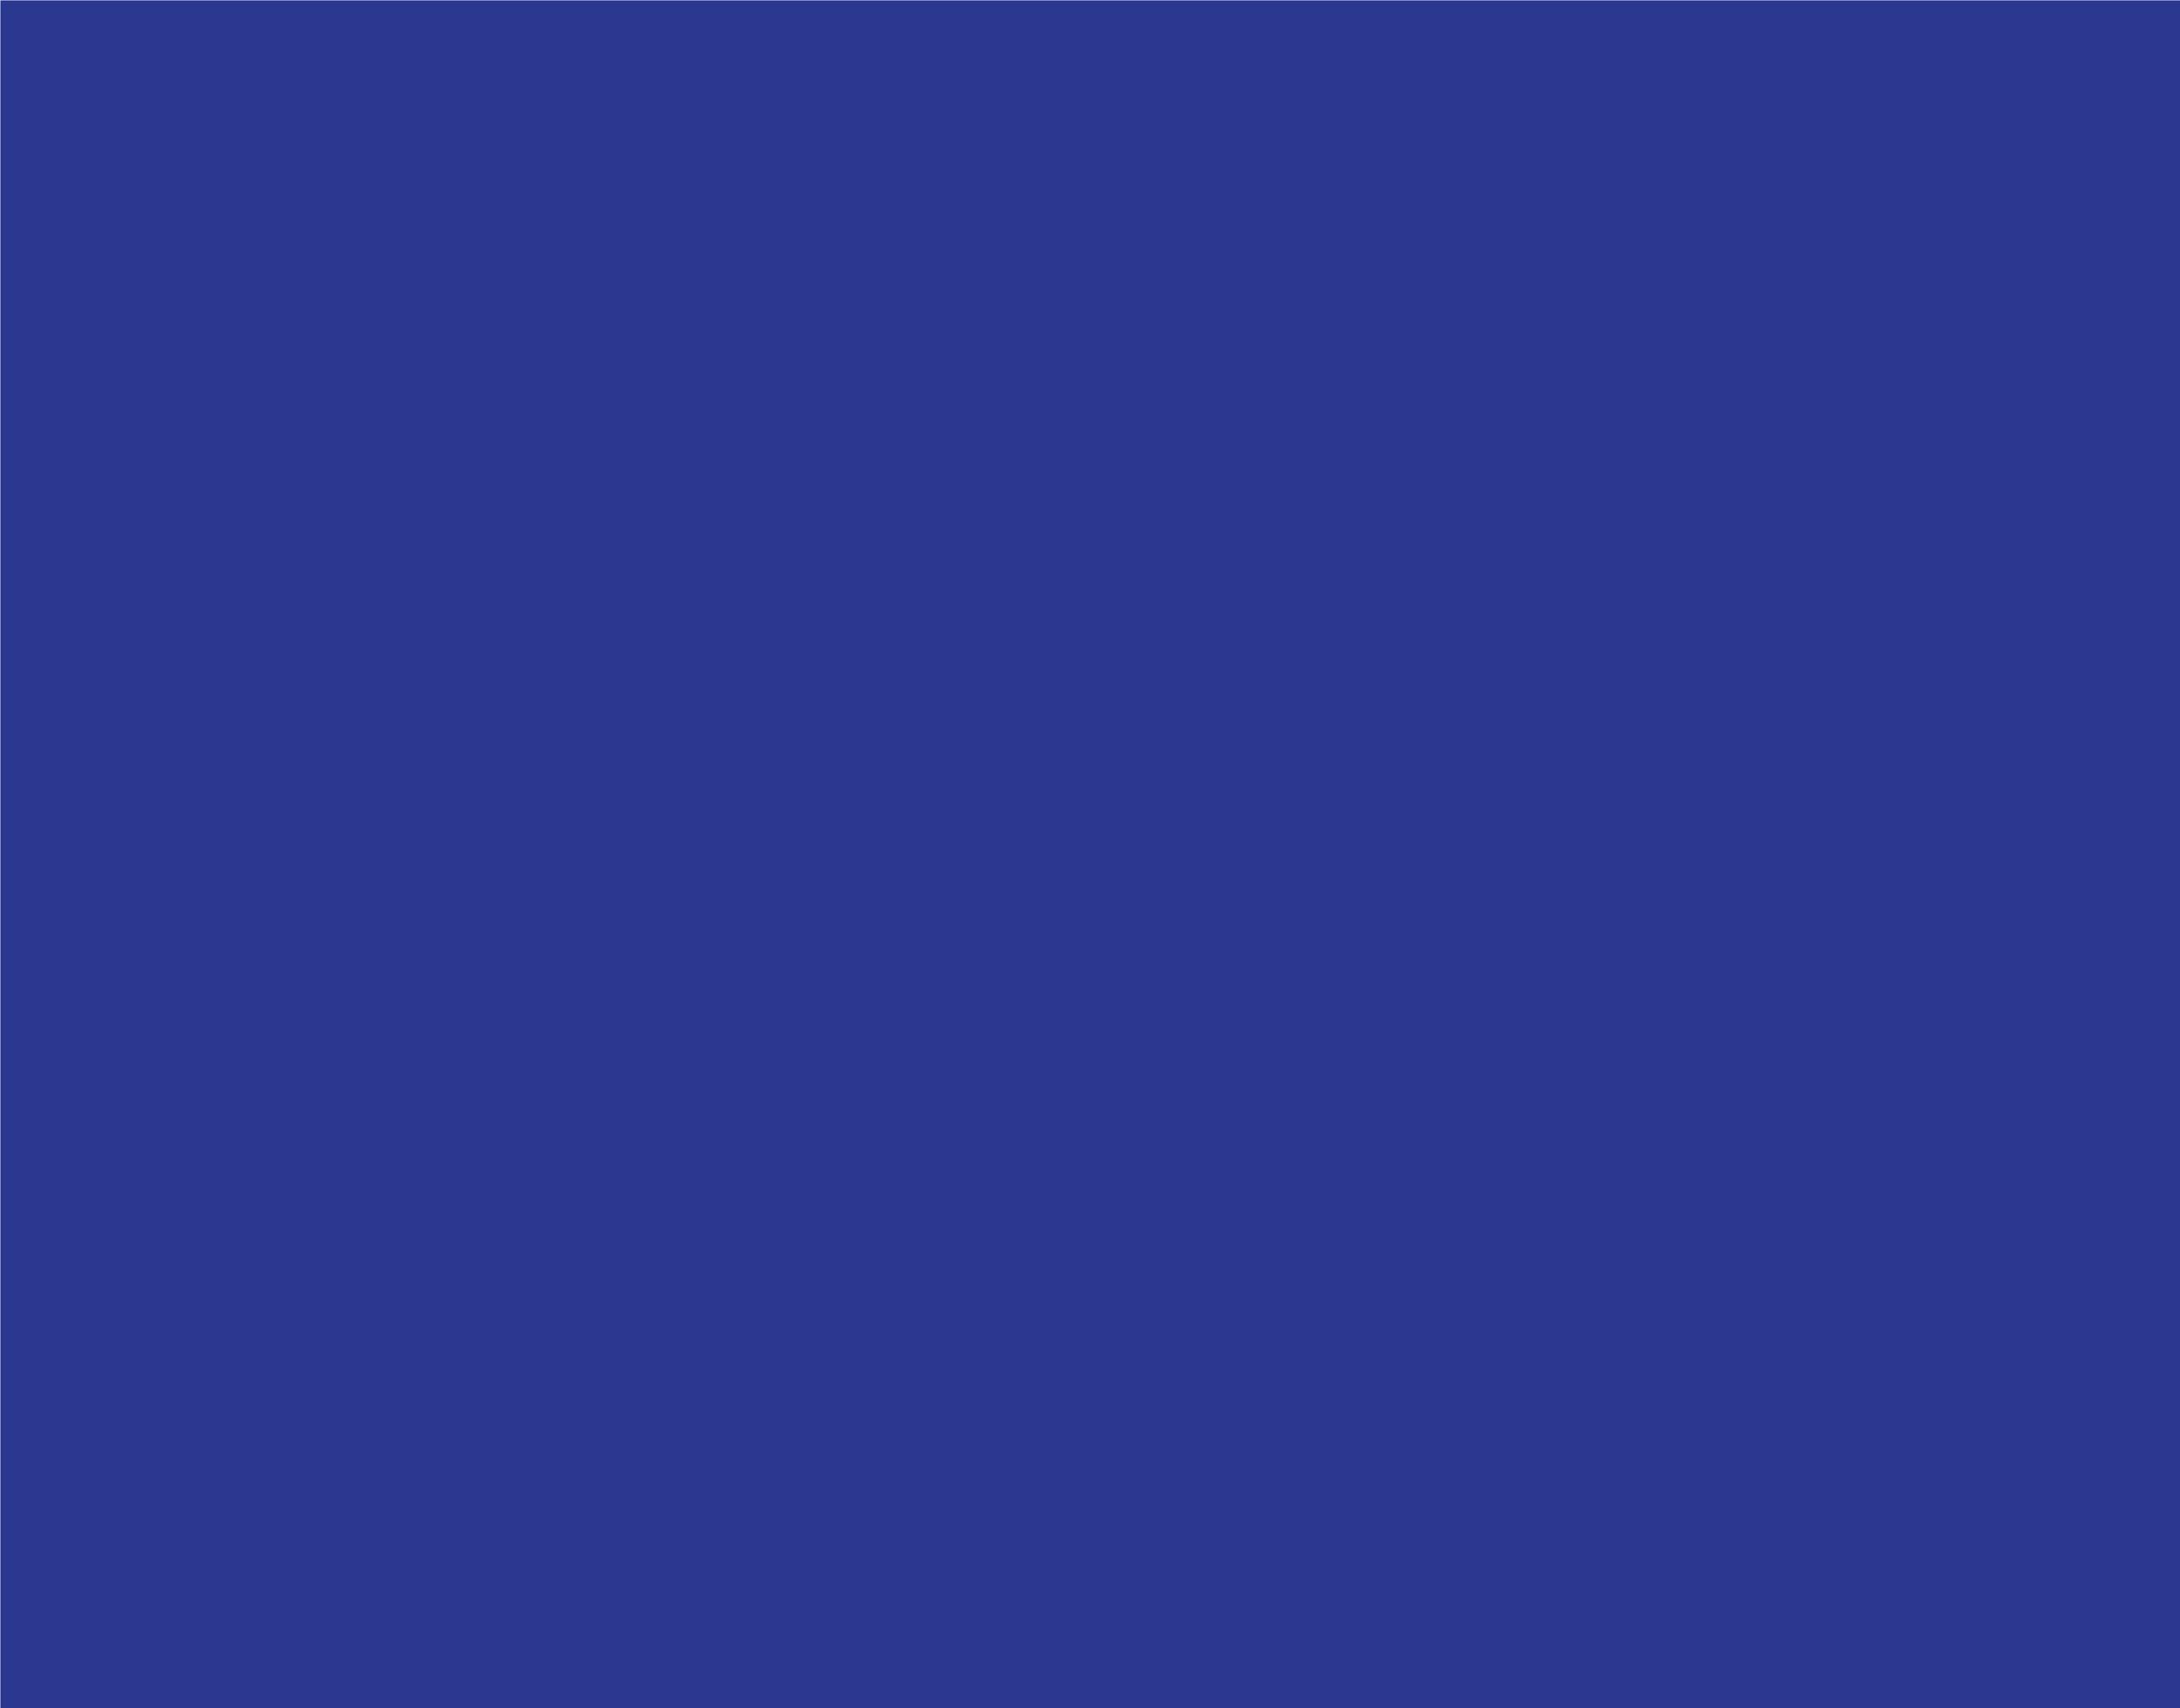 Current Members: - Roman Hitchev (Chair)Marisa Herson (General Secretary)AATB – Roman HitchevALABAT – Celina HorakAPASTB – Jinyoung JeongBAA – Linda ManningEATCB – Martin BörgelSATIBA – Michael Pepper